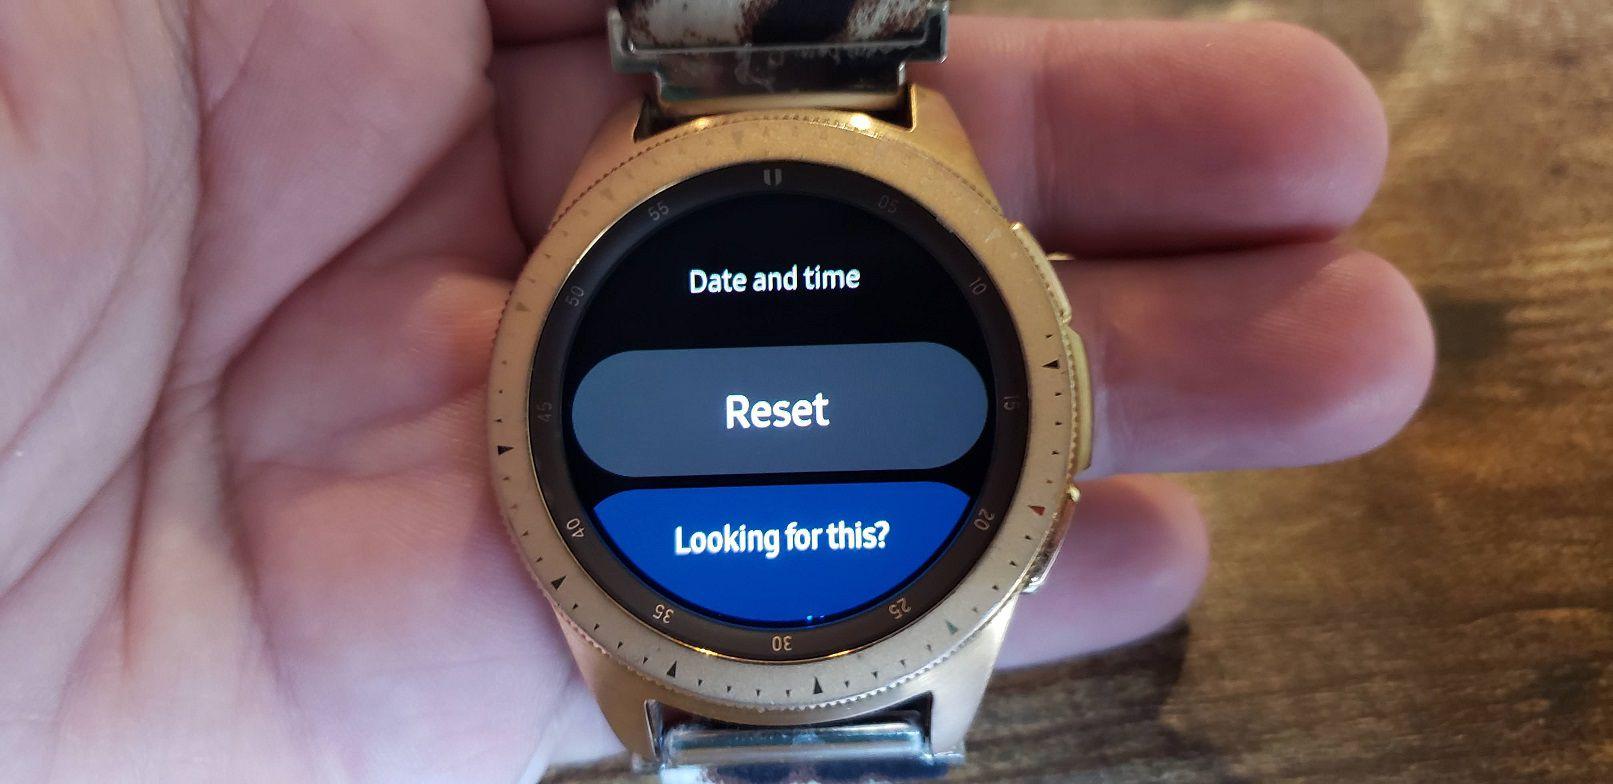 Samsung Galaxy Watch Settings and Reset sub menu.